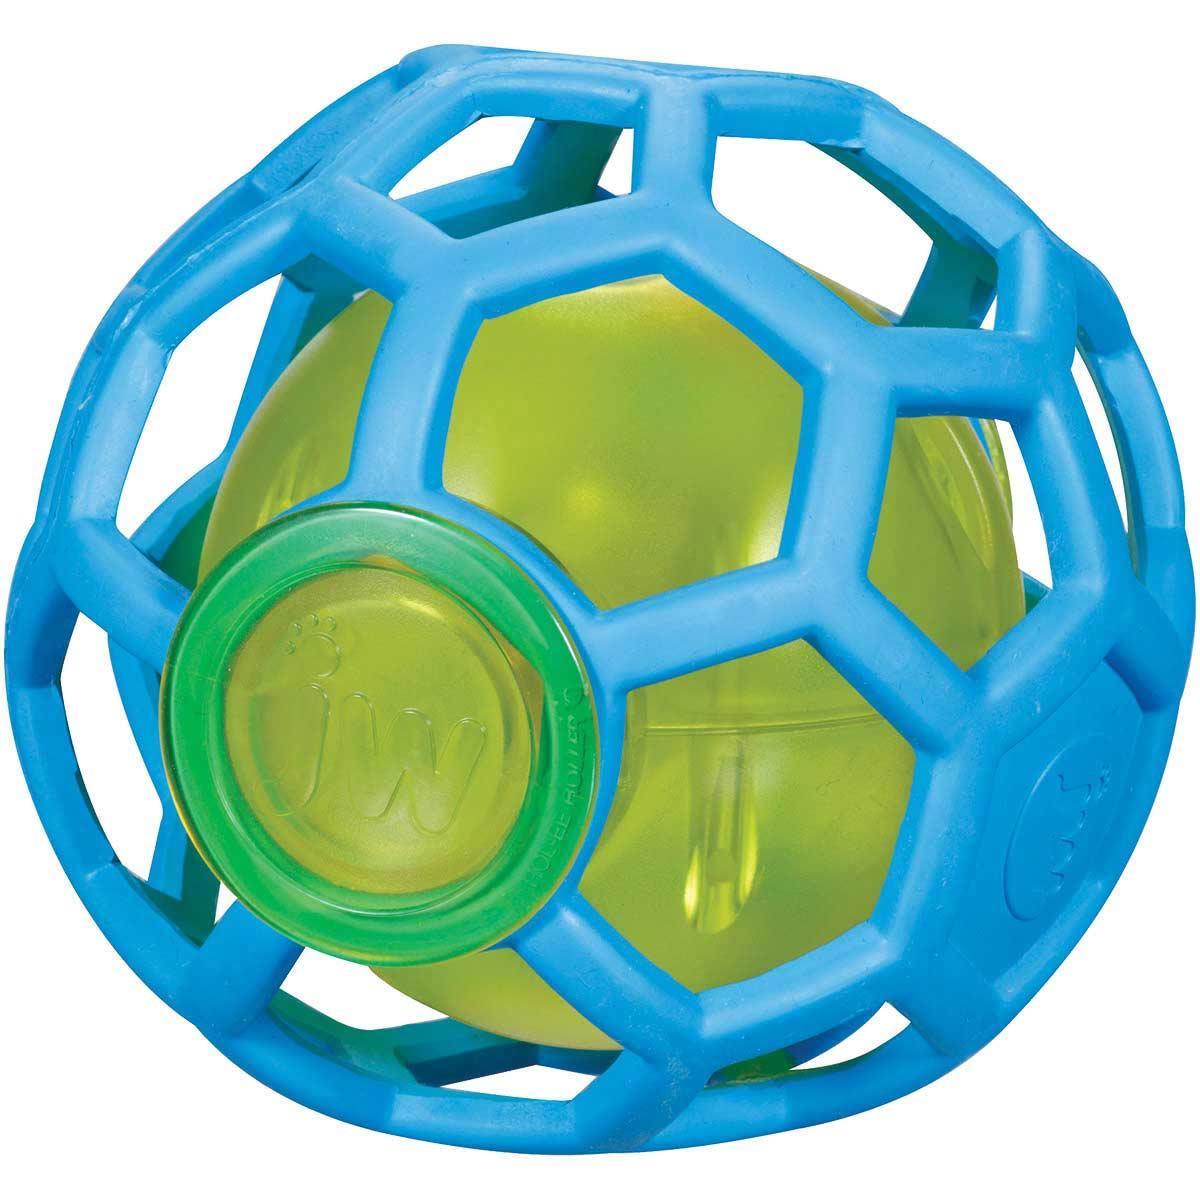 "Medium 8"" JW Hol-ee Treat Ball for Dogs"